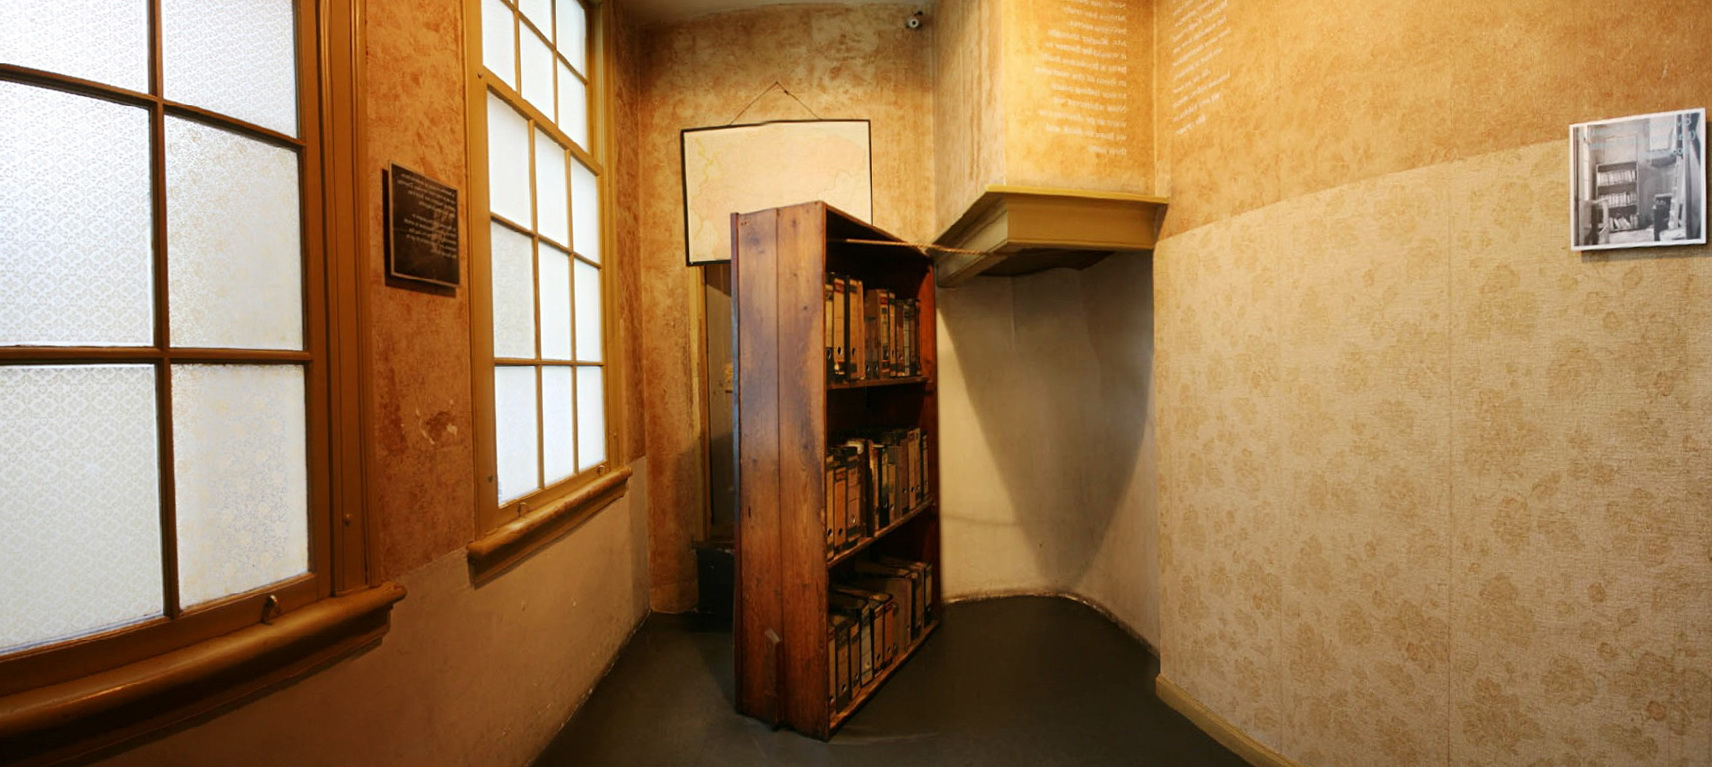 Anne Frank Secret Bookcase Door & Anne Frank Secret Bookcase Door | Home Design Ideas